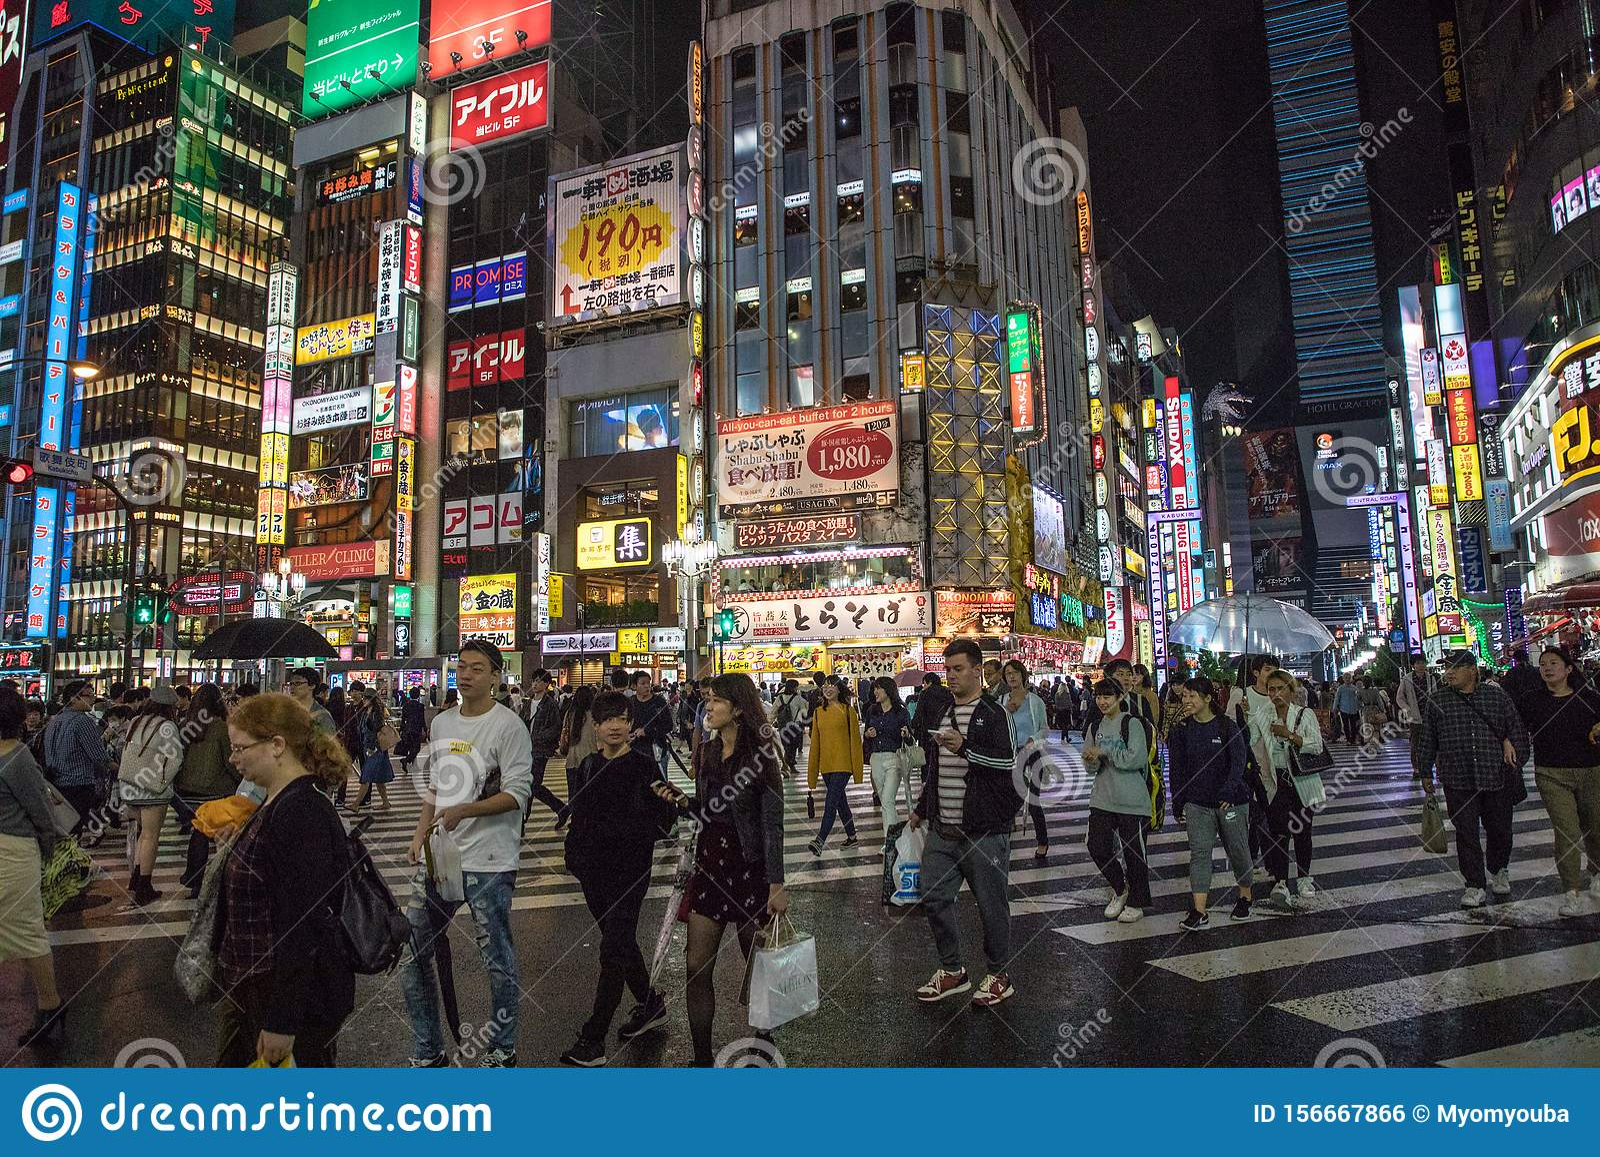 Japanese Street Photography Shibuya And Shinjuku Night Life People Are Walking Beside The Buildings Editorial Photo Image Of Tokyojapan Street 156667866